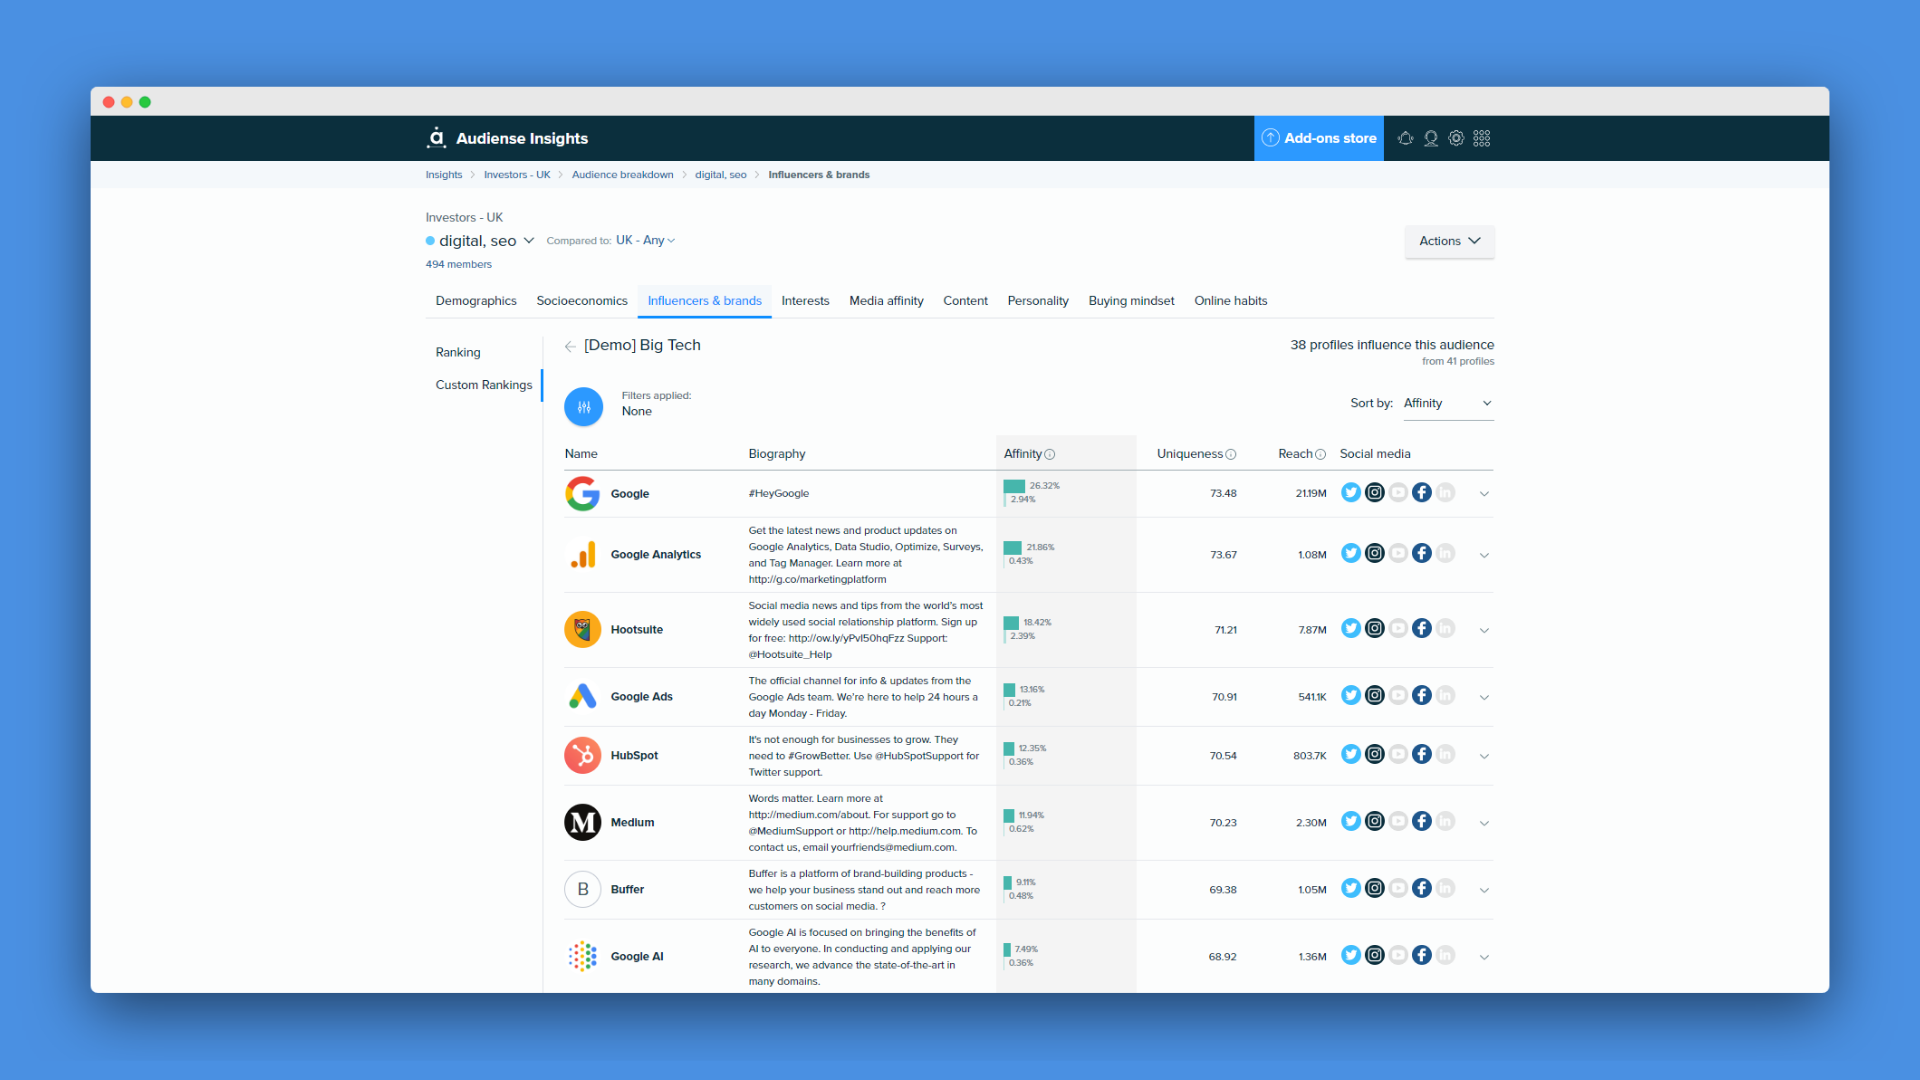 Audiense Insights - Product Update Custom Rankings